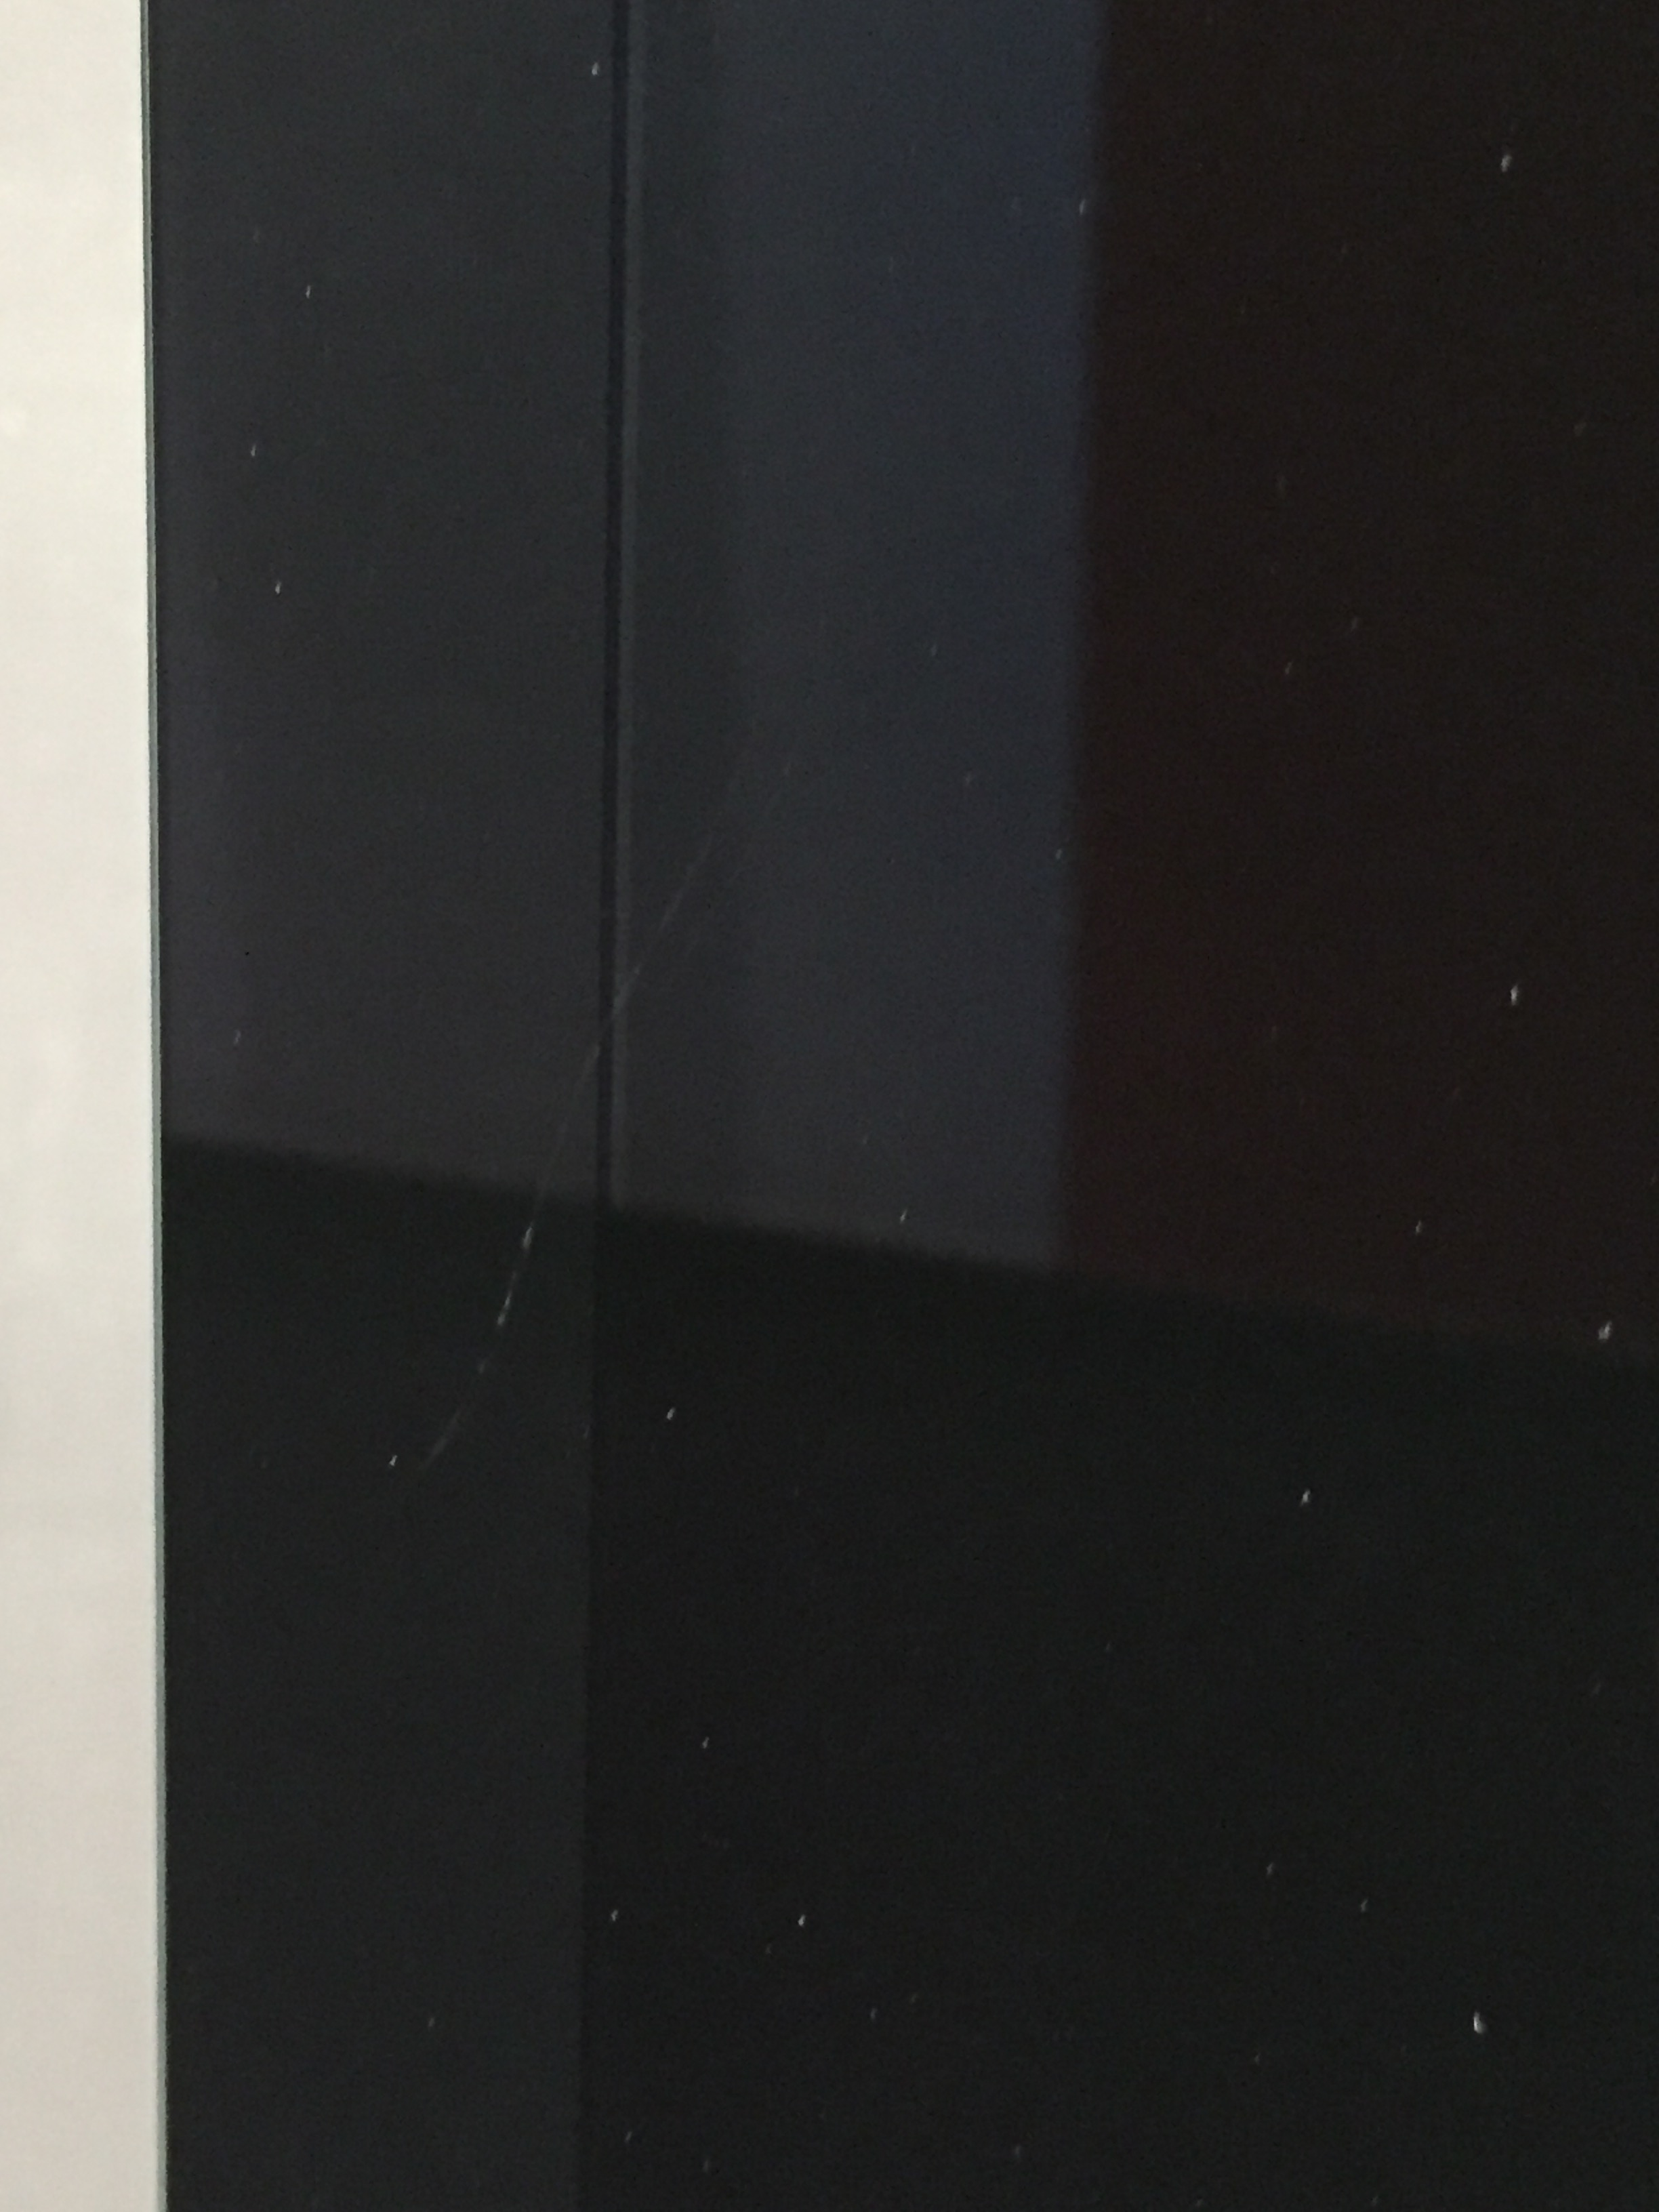 iMac 21.5-inch, Intel QuadCore i5 2,9 GHz, 8 GB, 1 TB en HDD, imagen 3